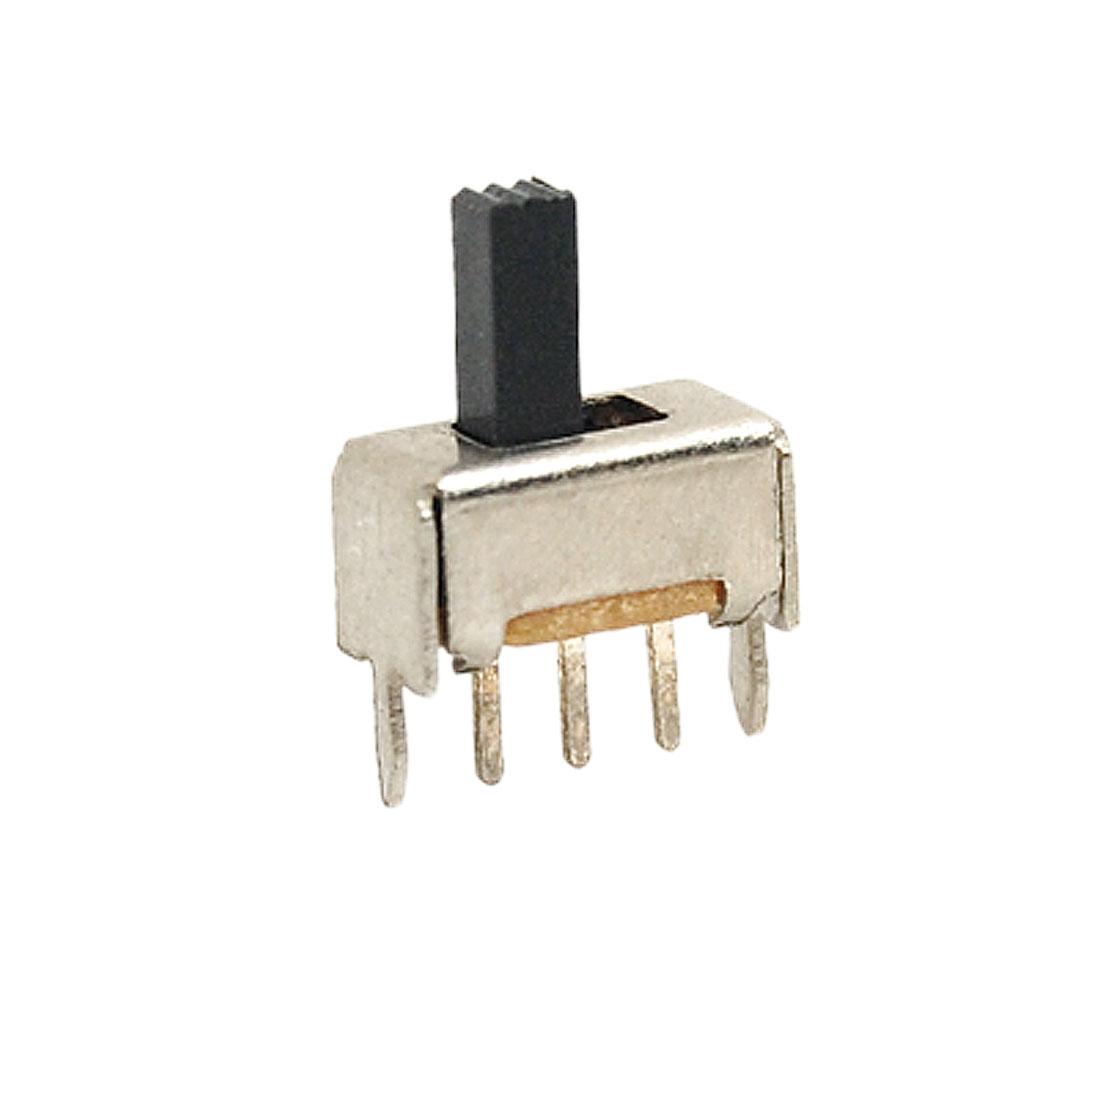 10x 5.3mm High Knob 3 Pin 2 Position 1P2T SPDT Vertical Slide Switch 0.3A 50V DC